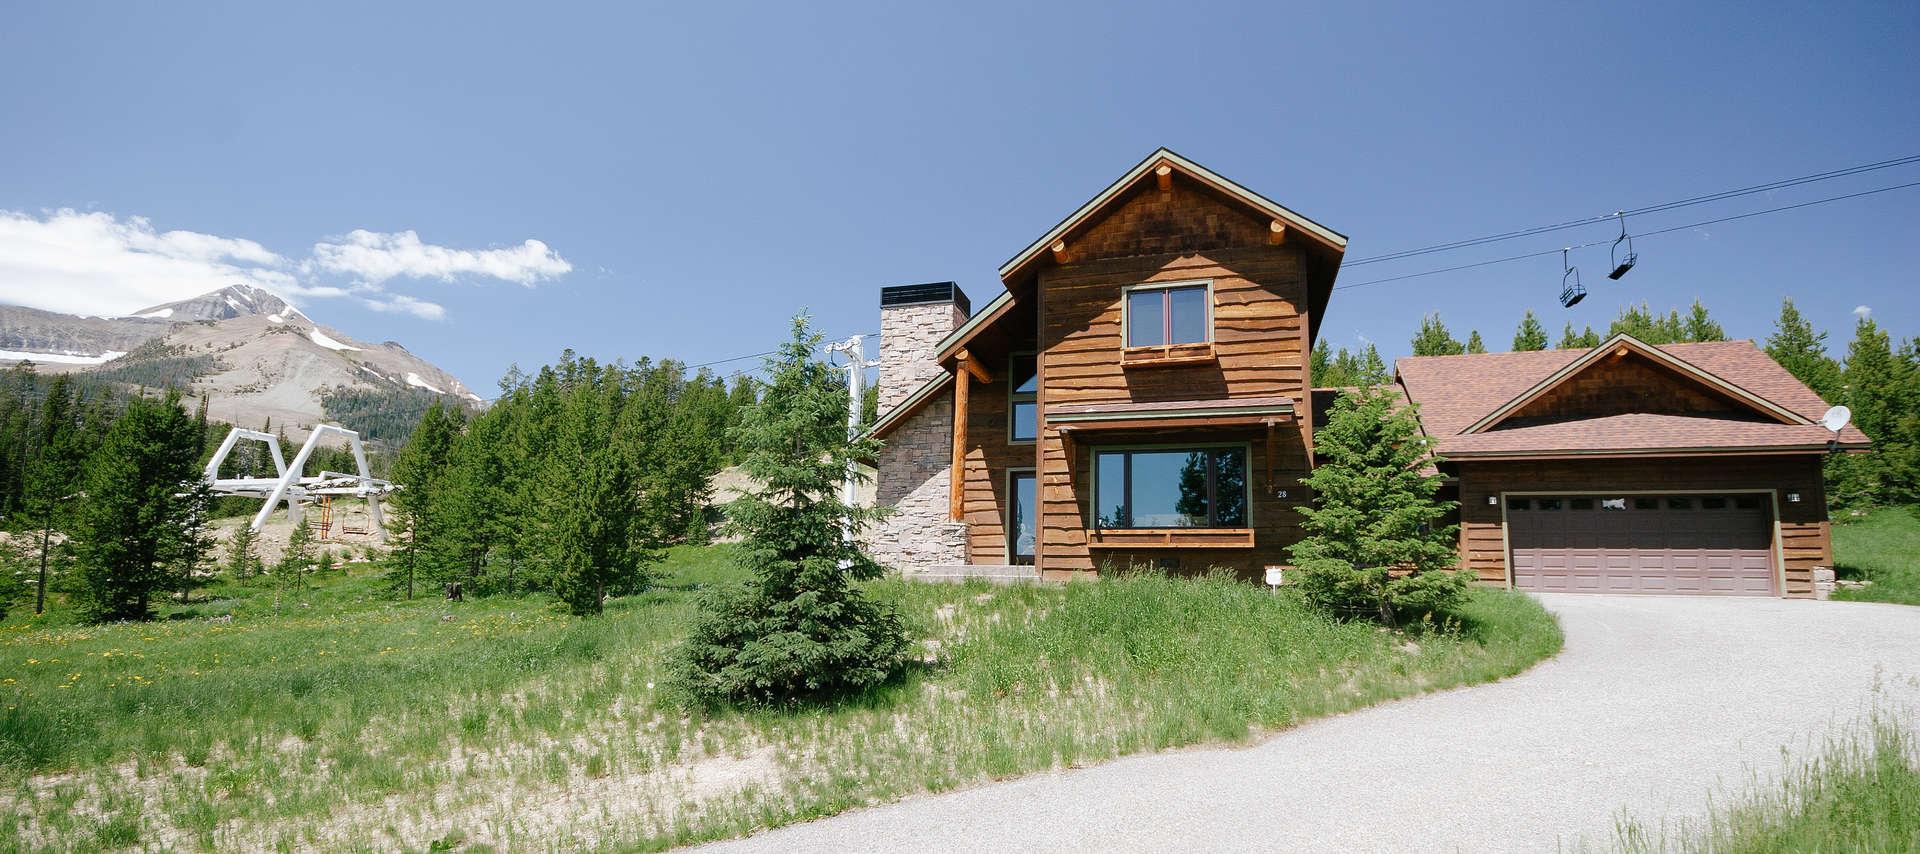 Luxury vacation rentals usa - Montana - Big sky - No location 4 - Twin Lift Lodge - Image 1/17